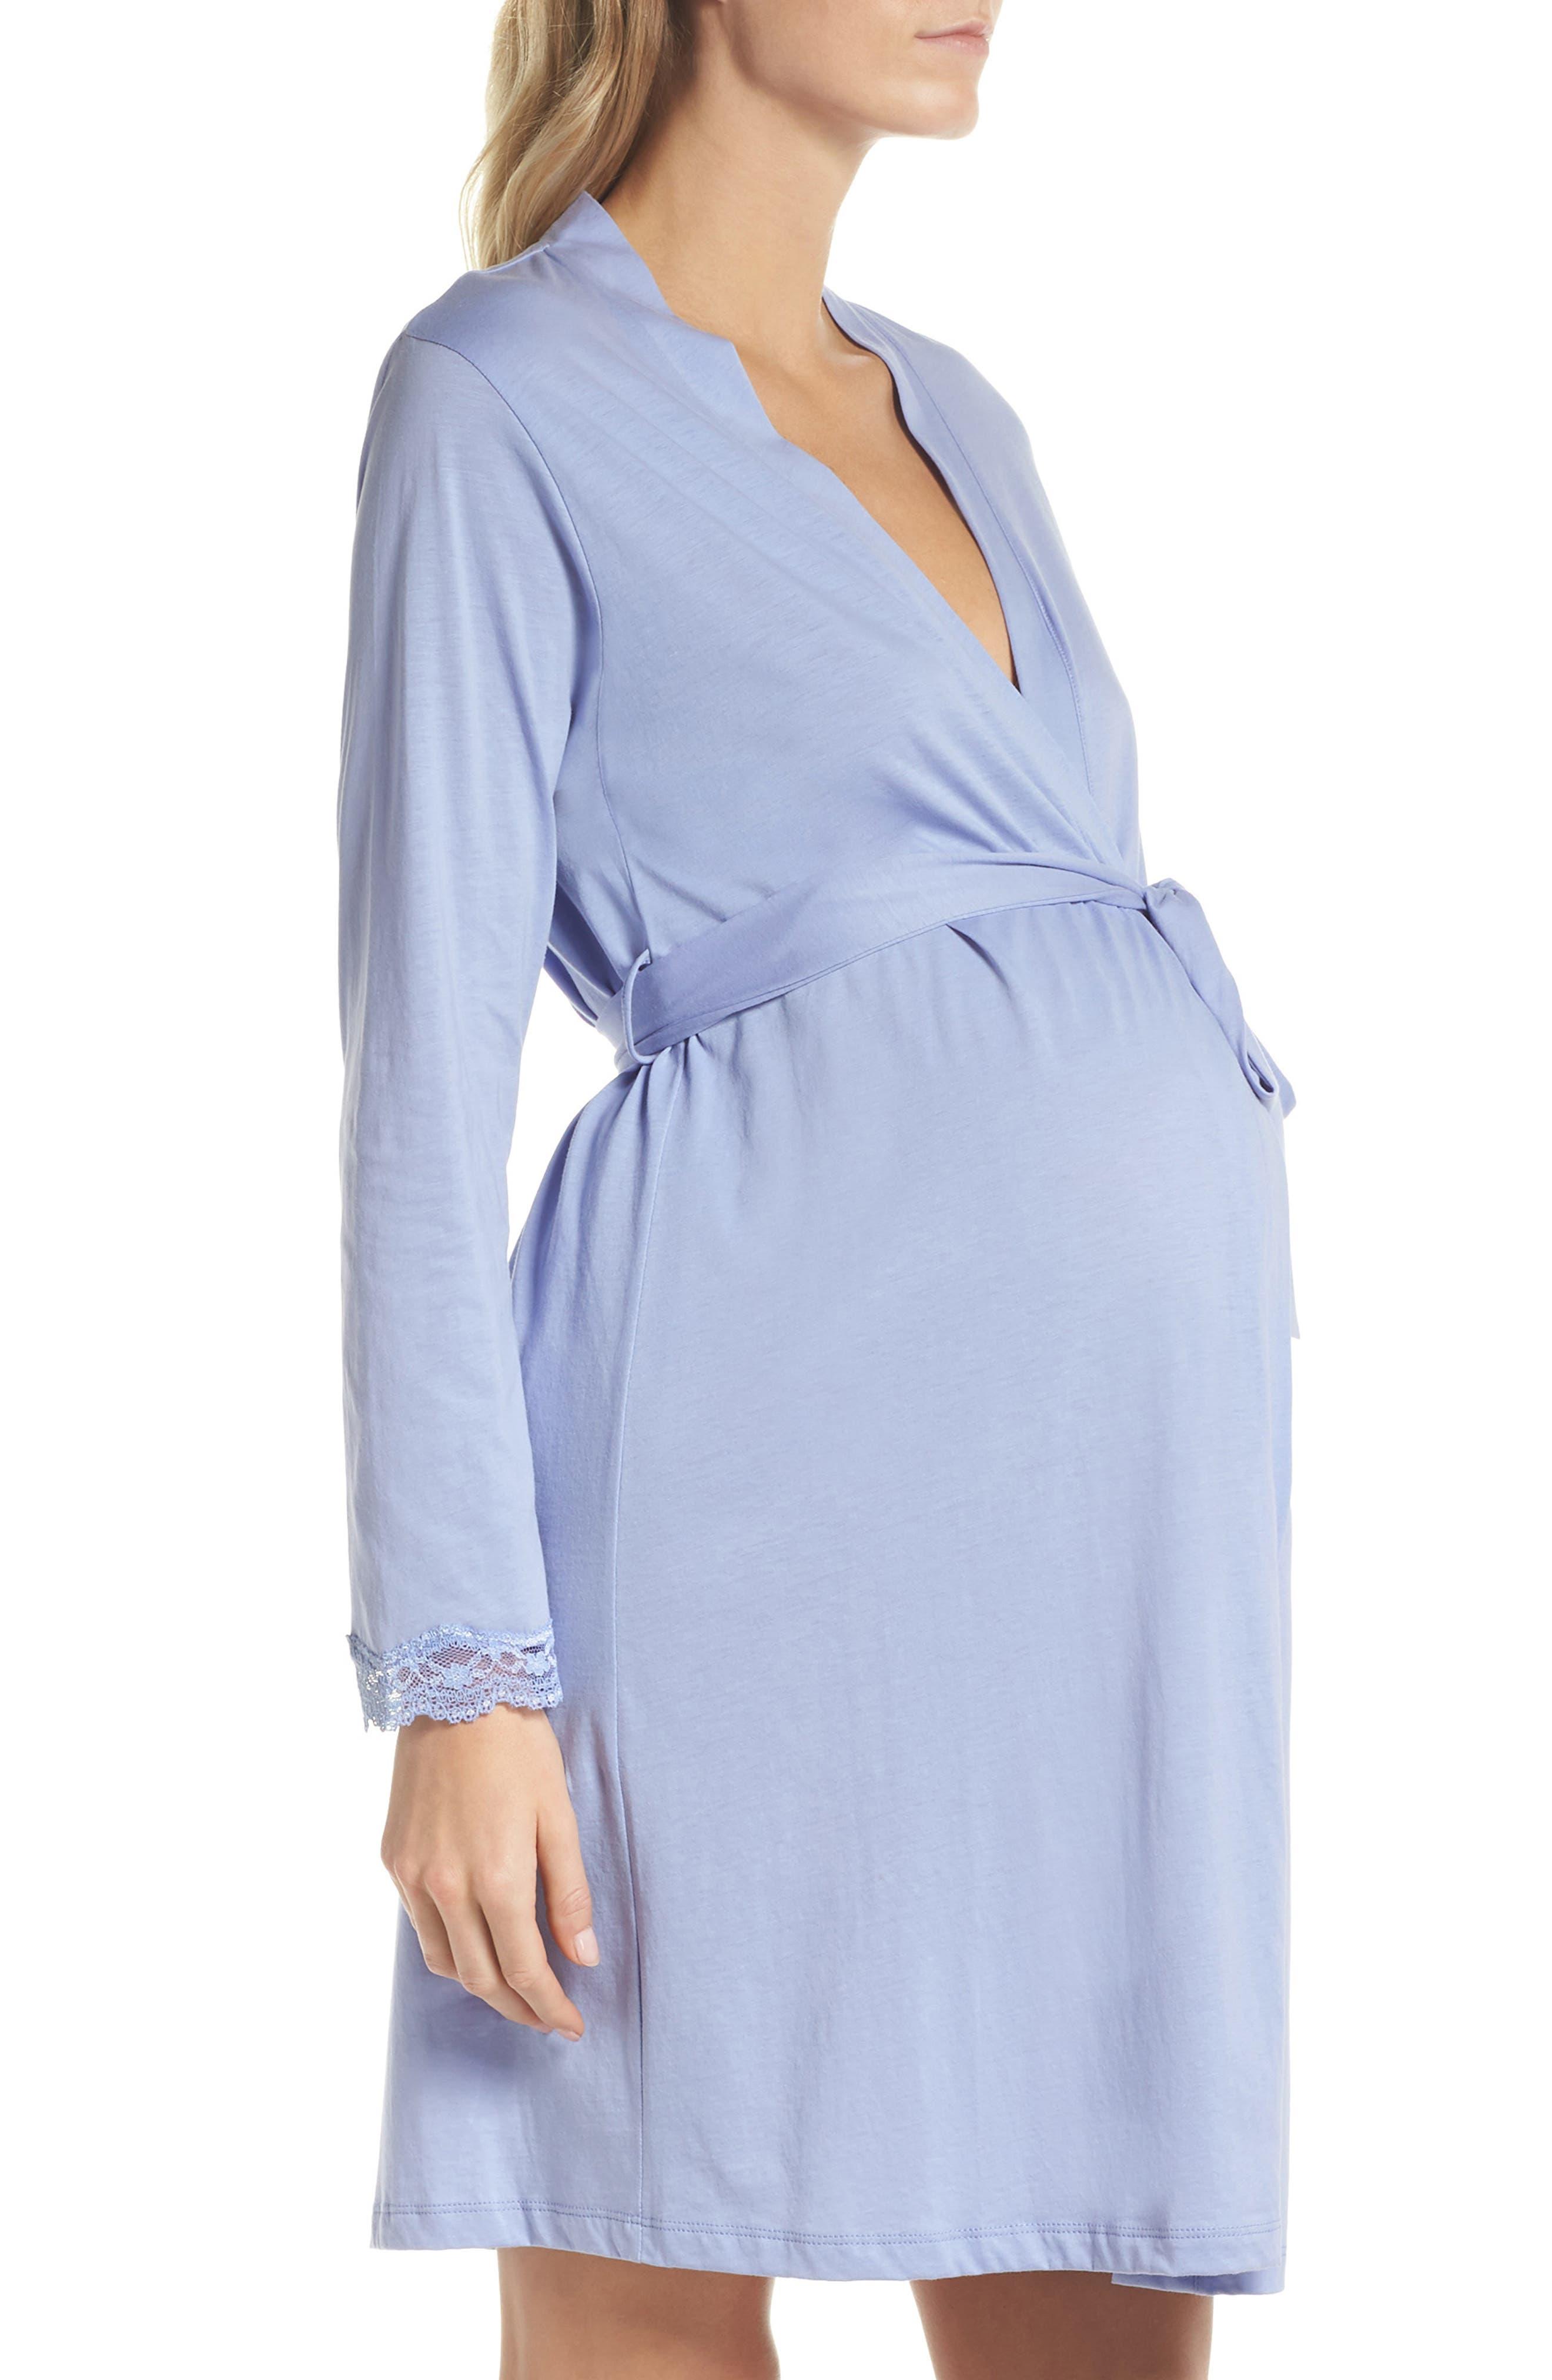 Violette Maternity/Nursing Robe,                             Alternate thumbnail 3, color,                             PURPLE